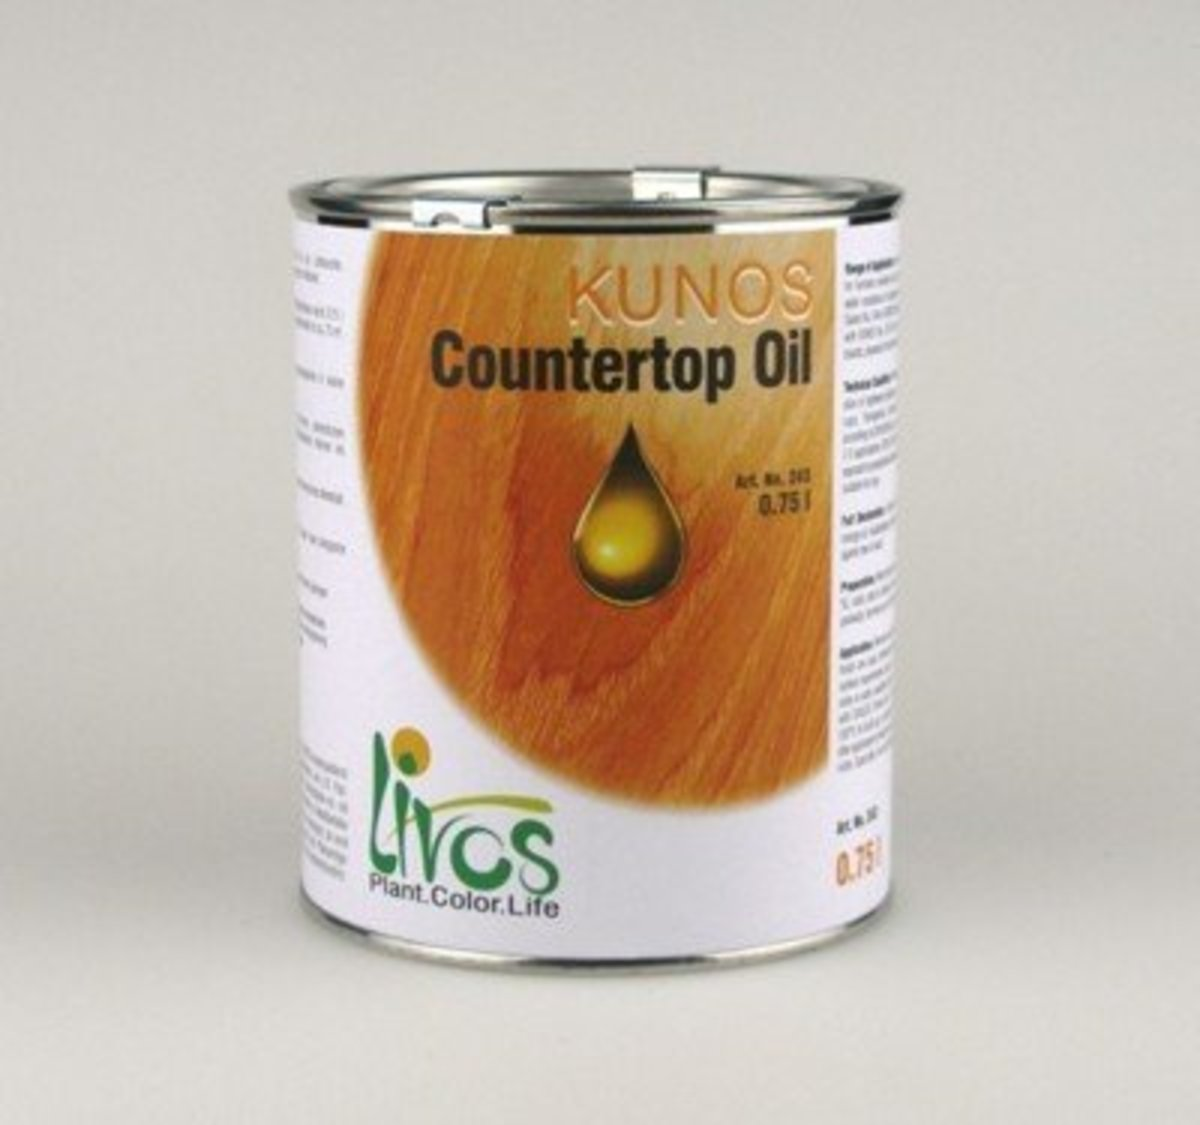 Kunos Countertop Oil 2.5L